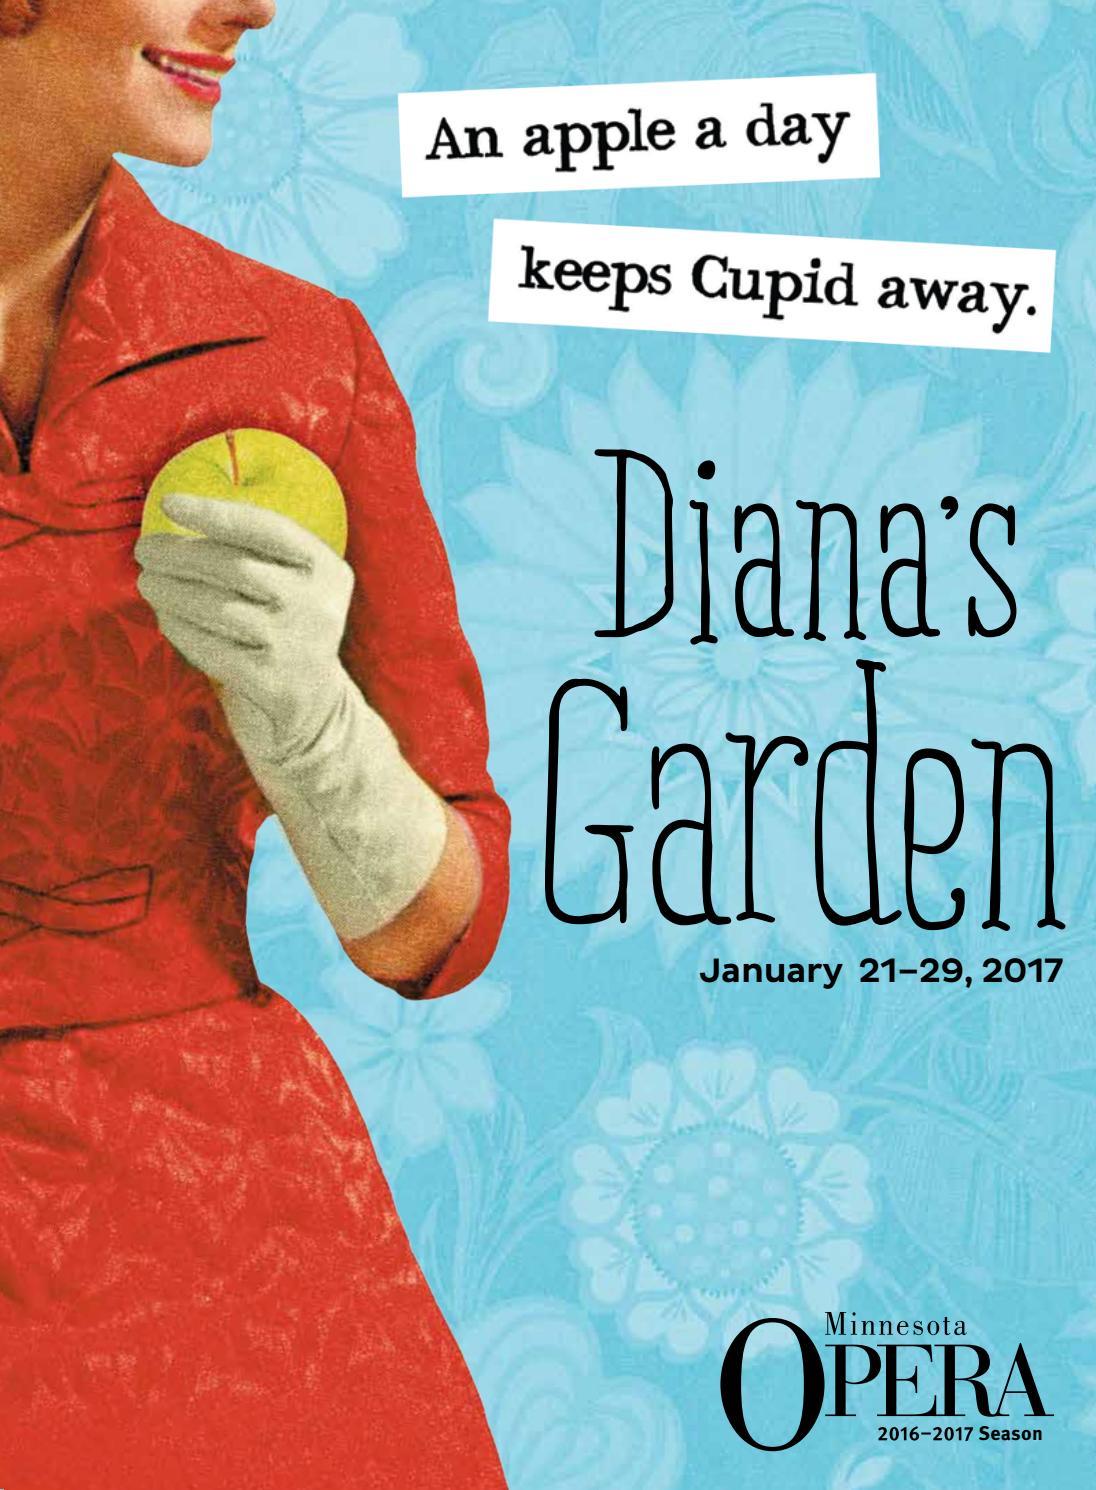 Minnesota Operas Dianas Garden by Minnesota Opera issuu